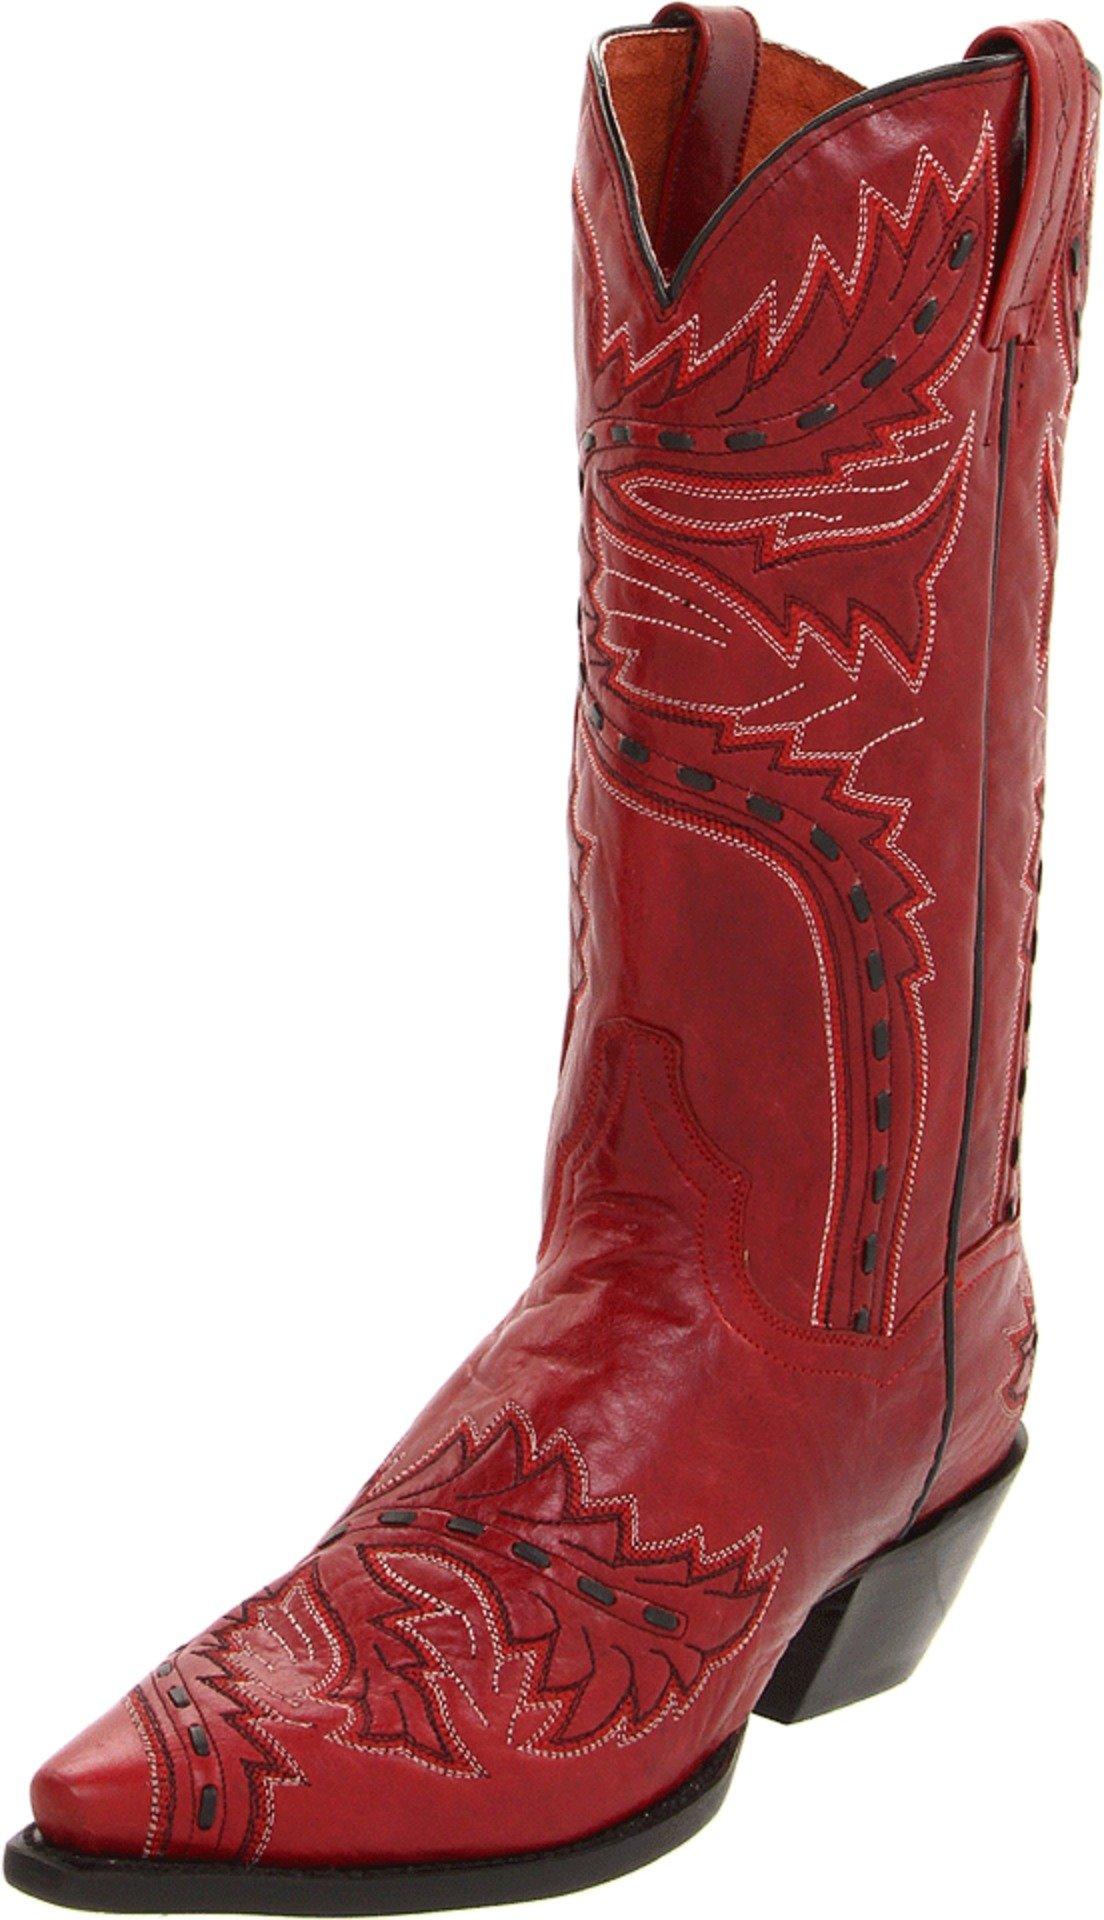 Dan Post Women's Sidewinder Western Boot,Red,6.5 B (M) US